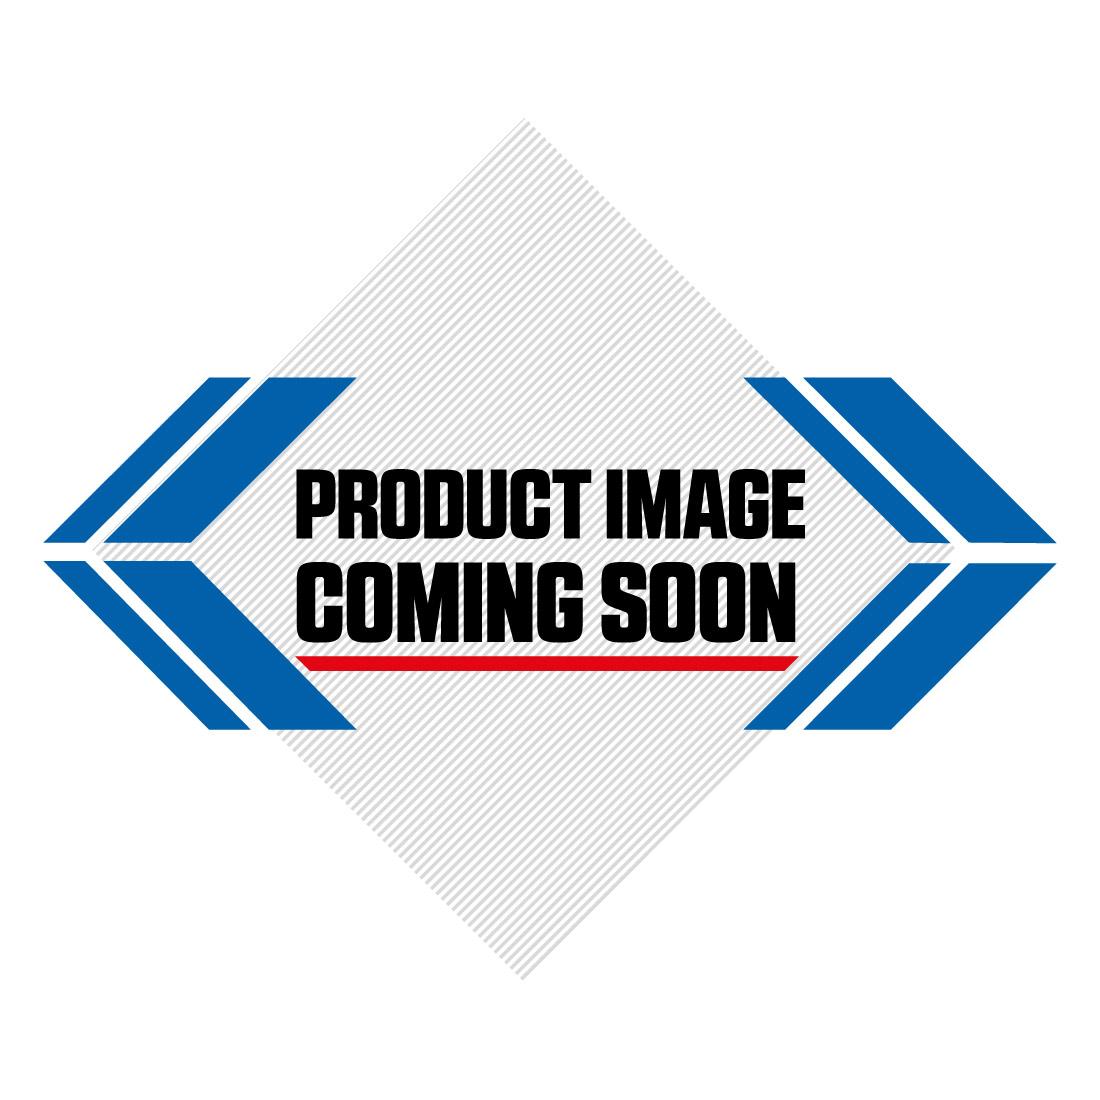 Kawasaki Restyled Plastic Kit KX 85 (2010) OEM Factory Image-2